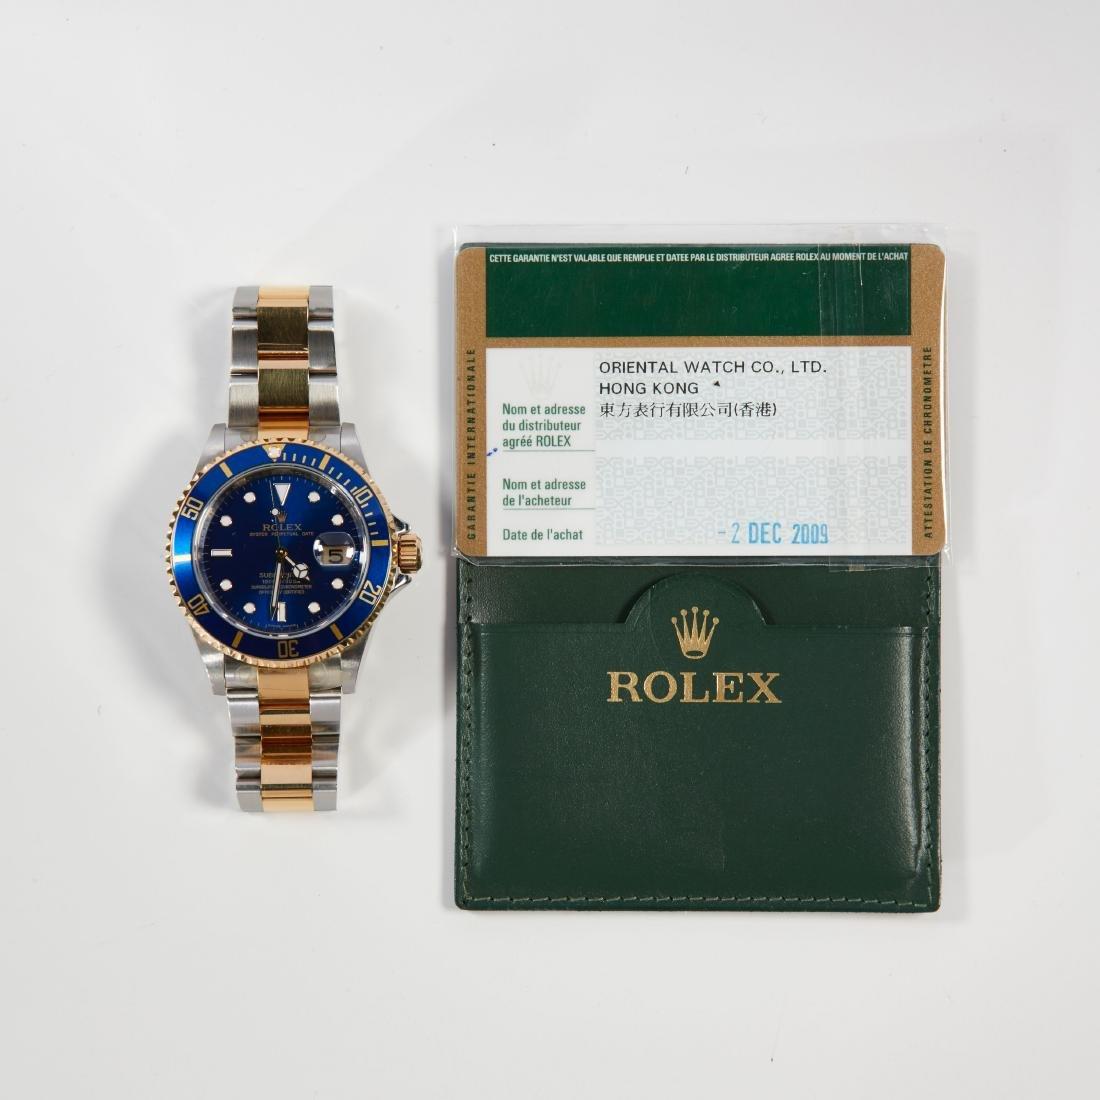 Rolex, Blue Submariner, Ref. 16113 - 3